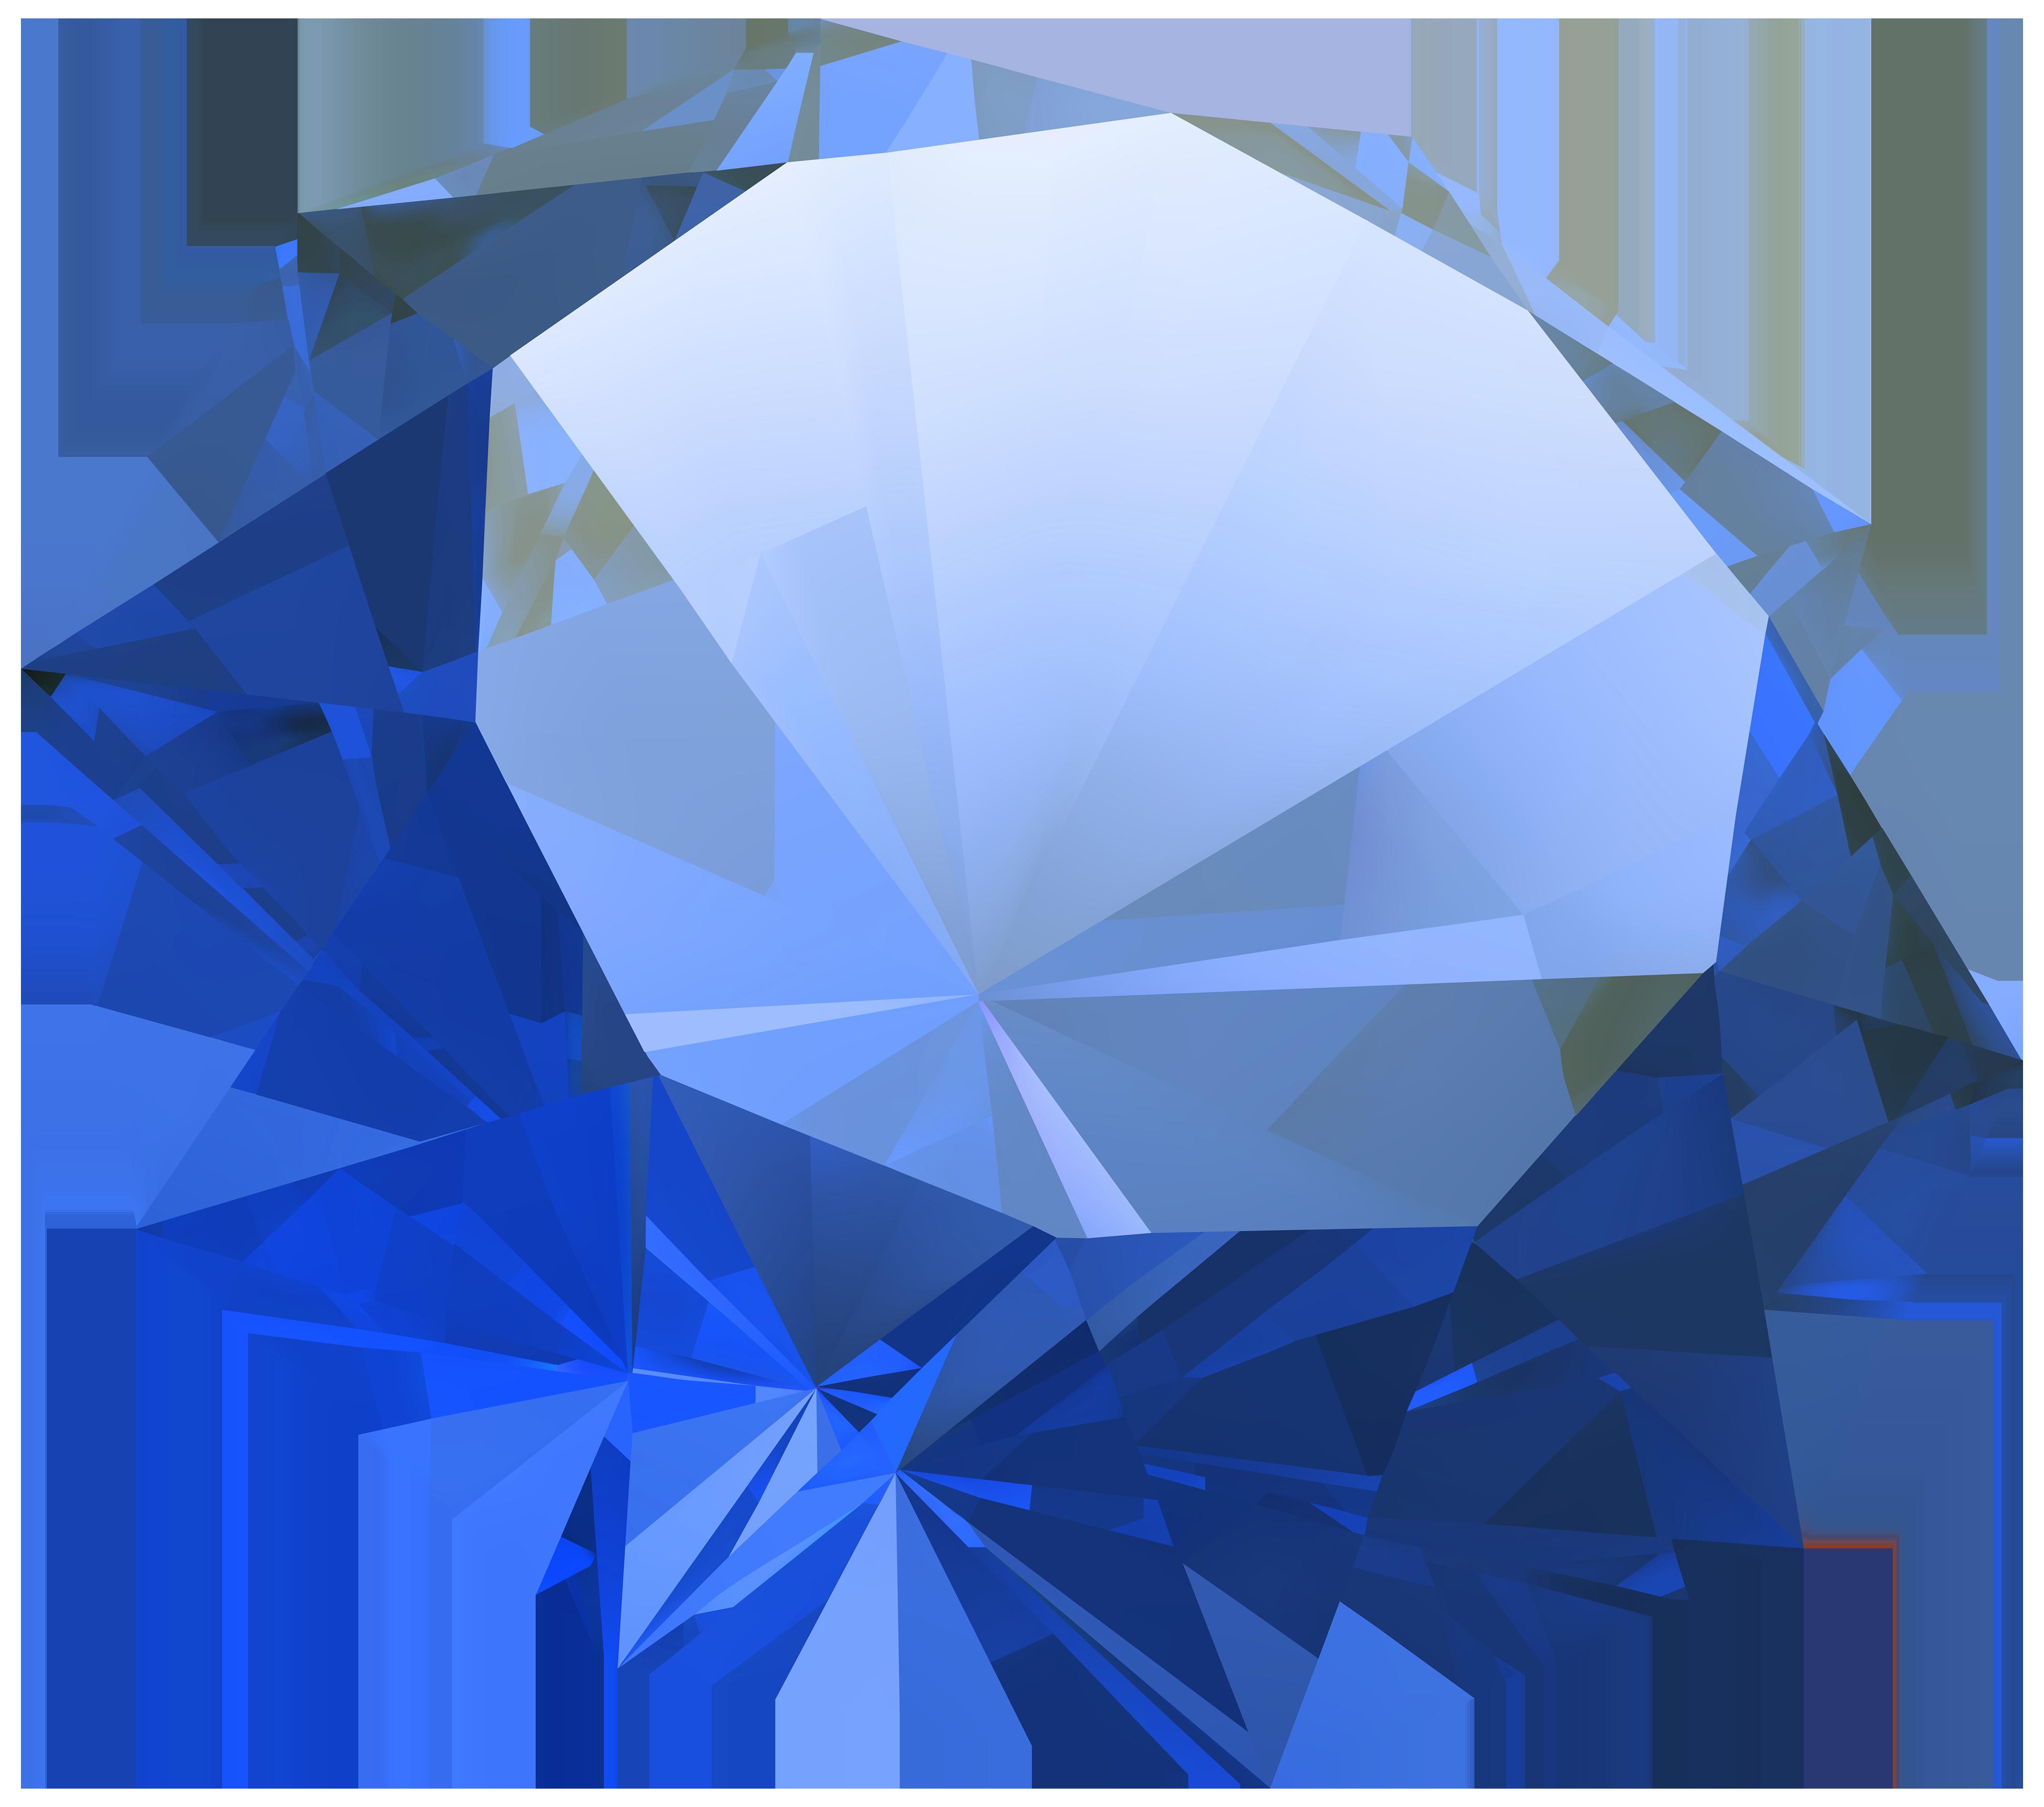 Sapphire Gem Png Image Gems Purple Diamond Clip Art